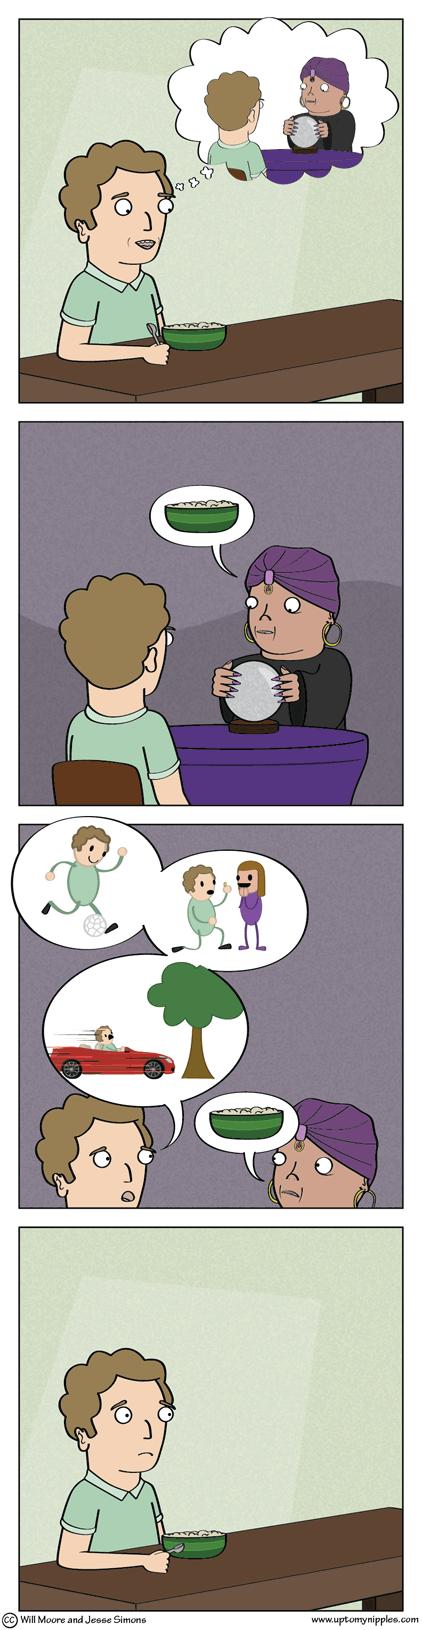 Cream of Clairvoyance comic